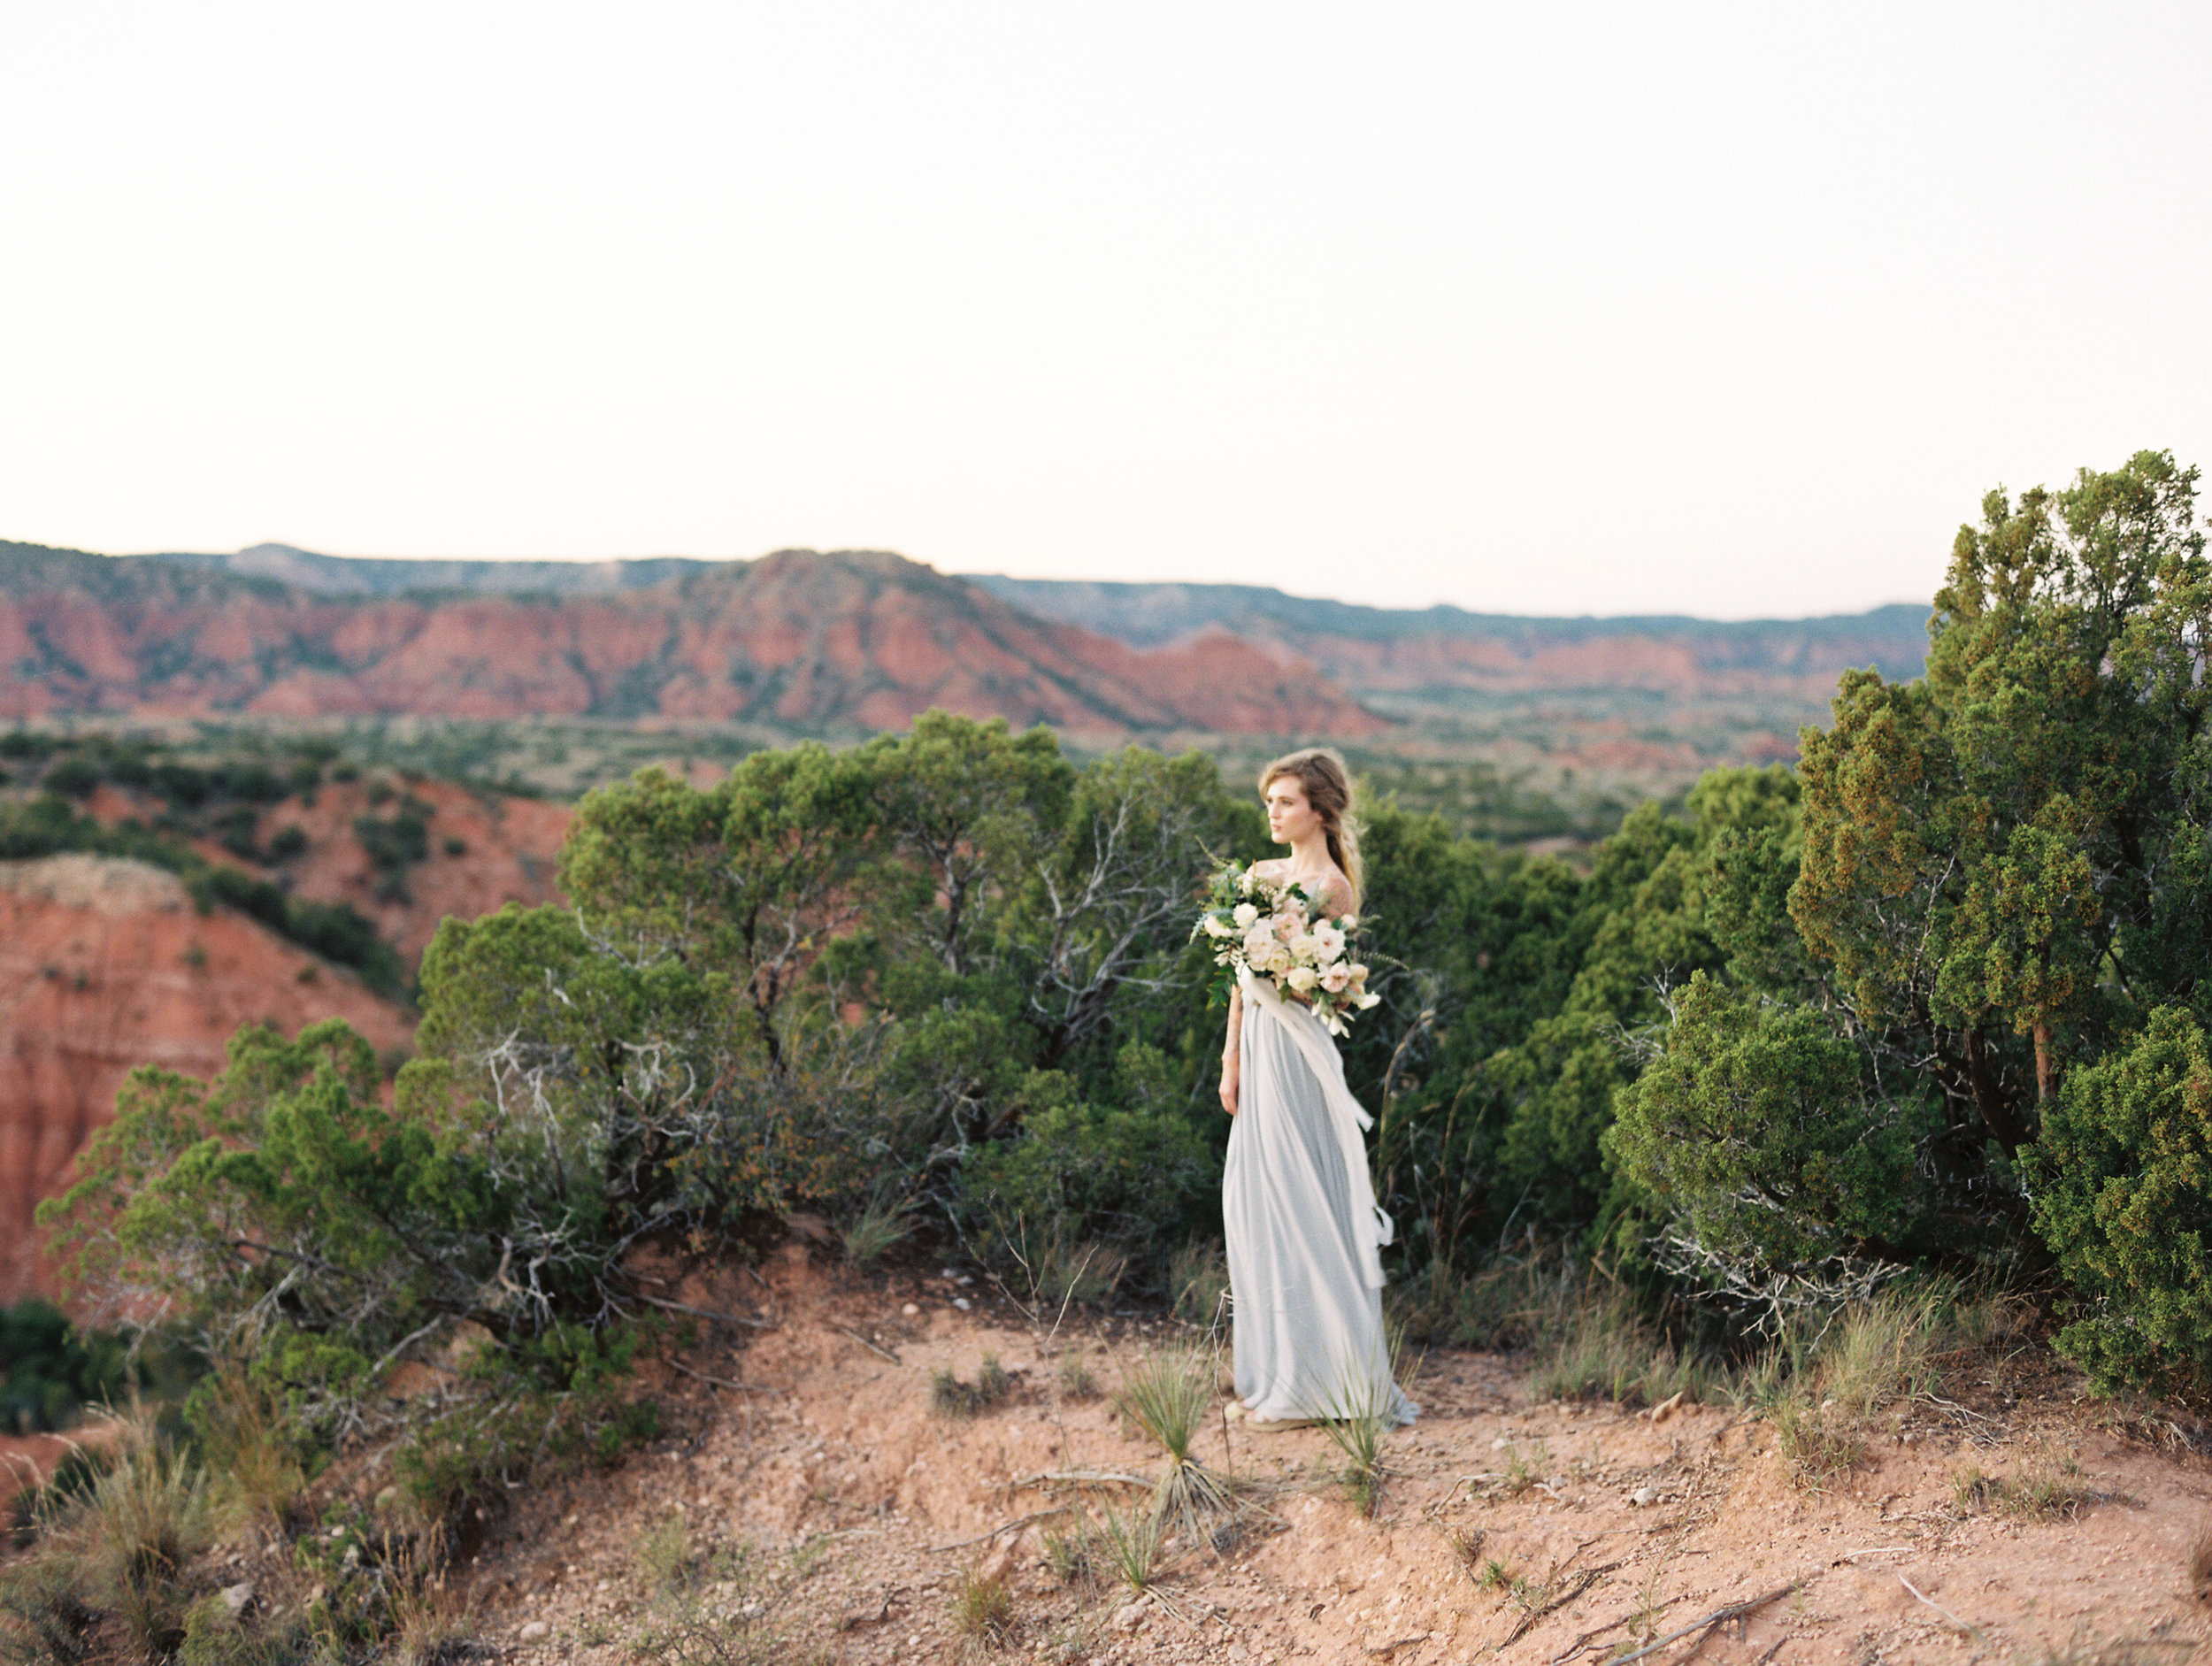 Katie-Rivera-Photography-Caprock-Canyon-Styled-Shoot-Candelaria-Designs-029.jpg